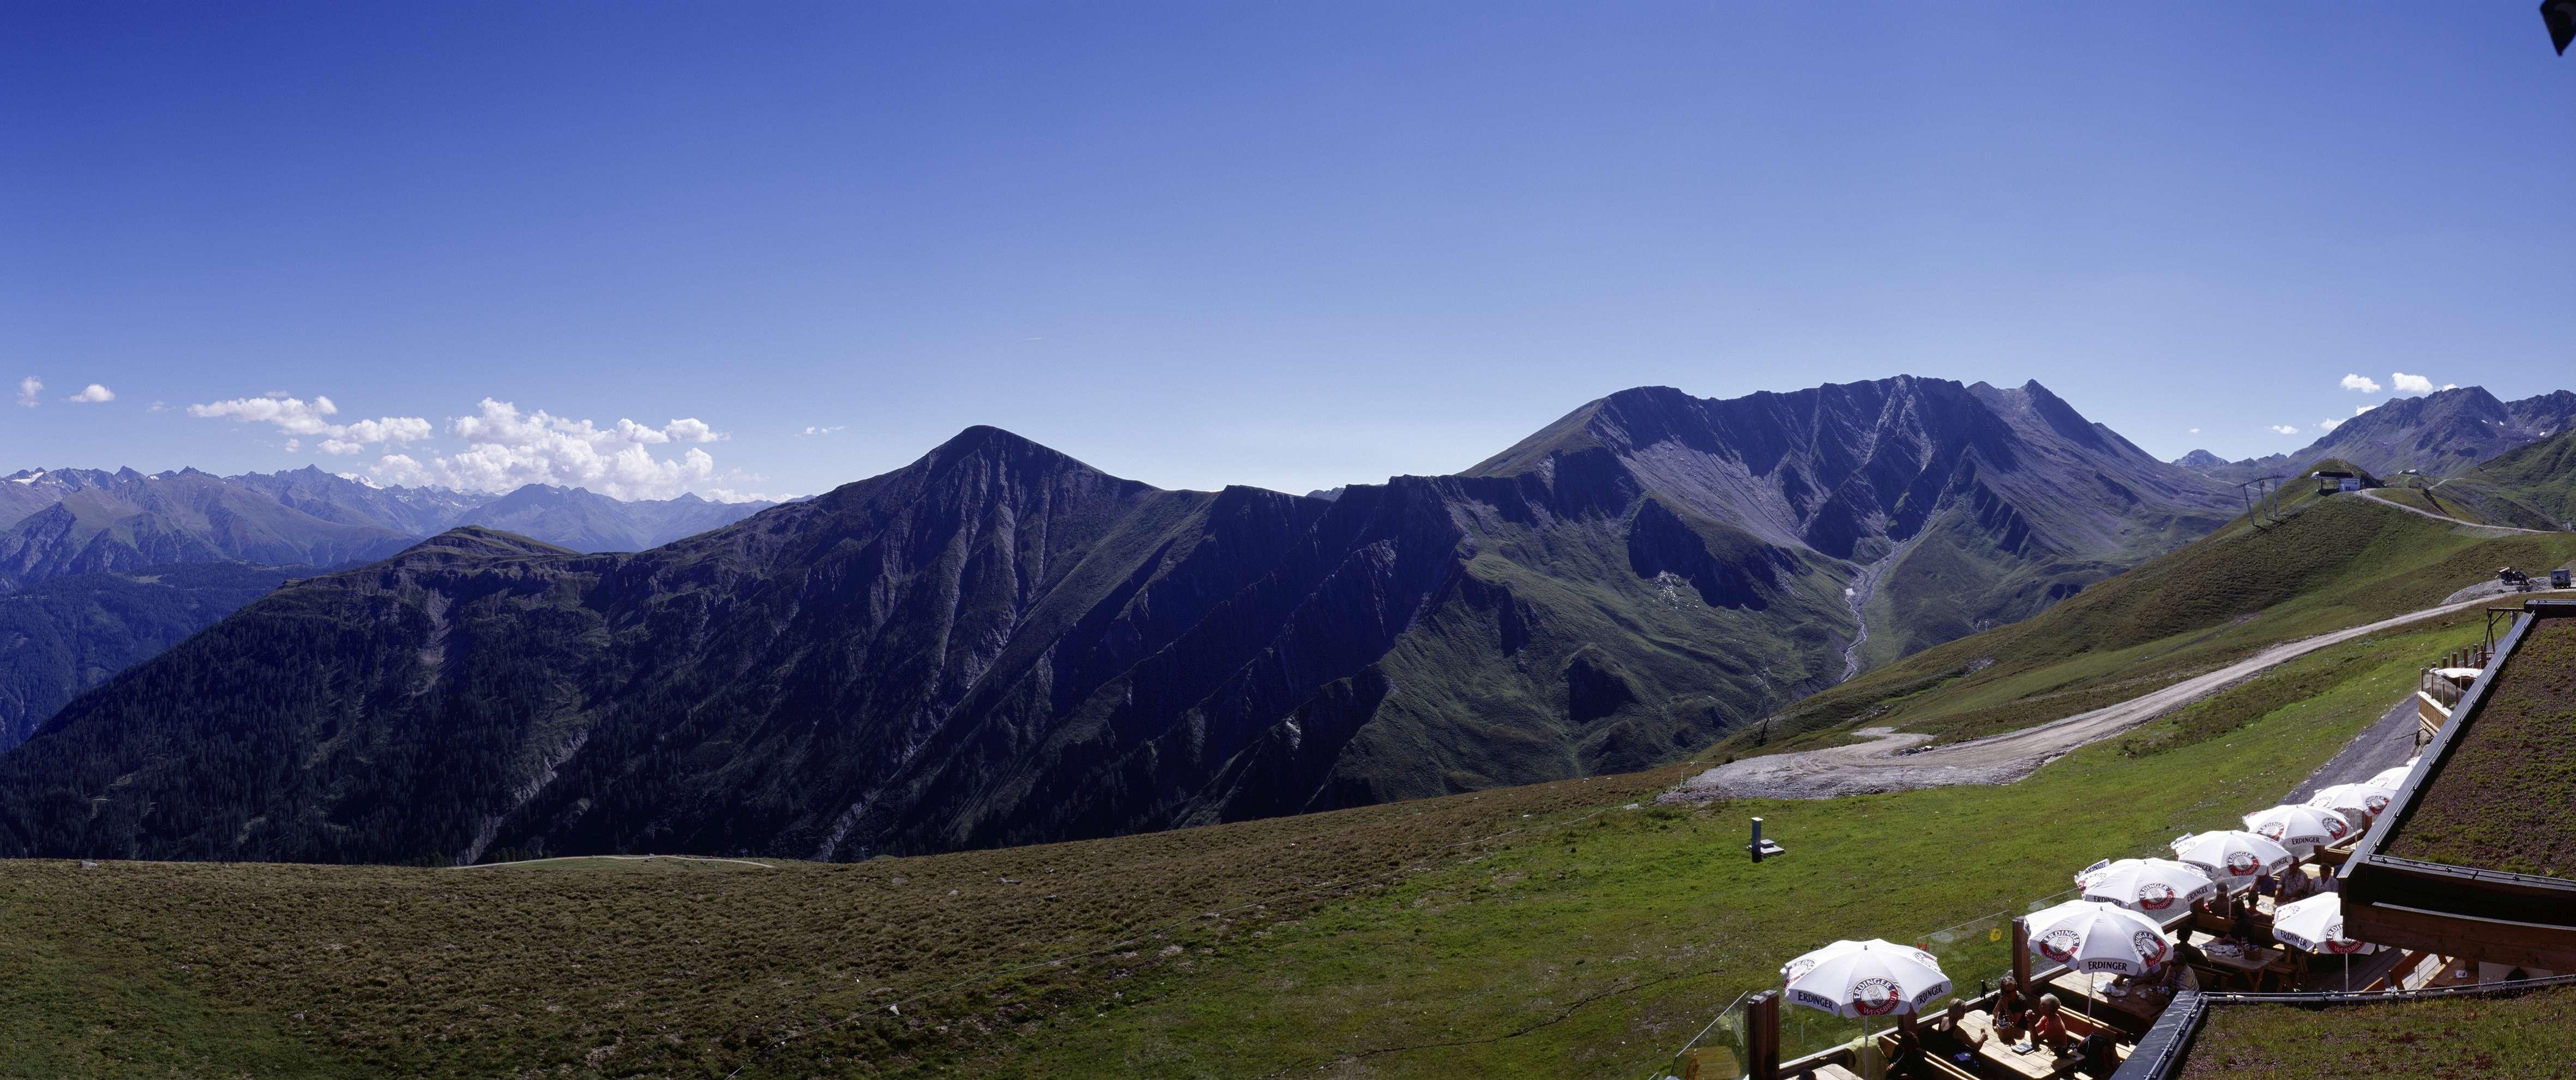 Wanderurlaub in Serfaus-Fiss-Ladis